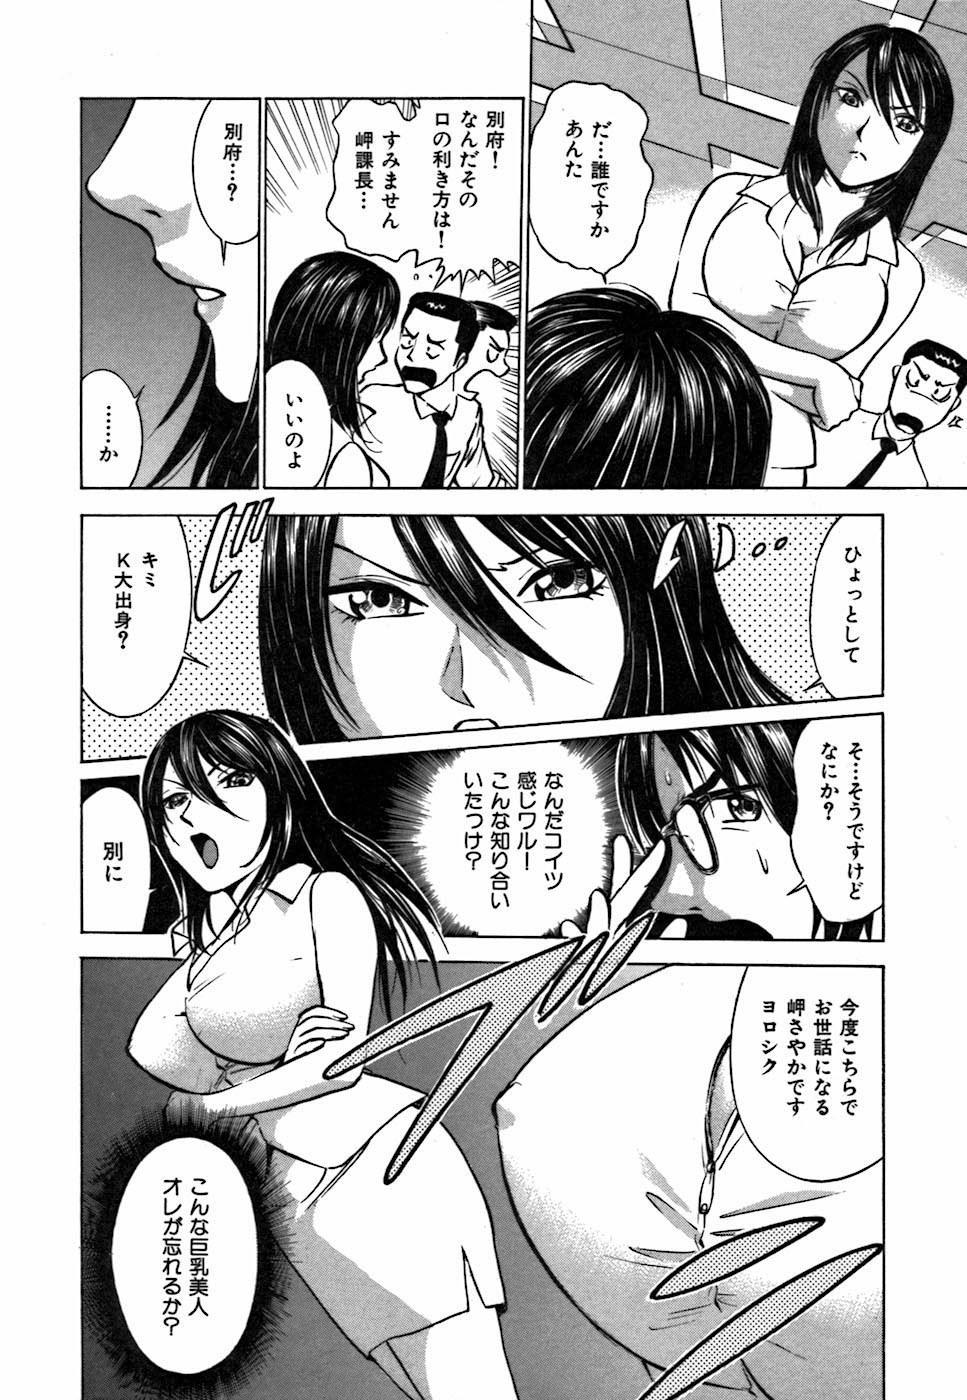 Kimi ga Nozomu Katachi | Appearance for which you hope 7